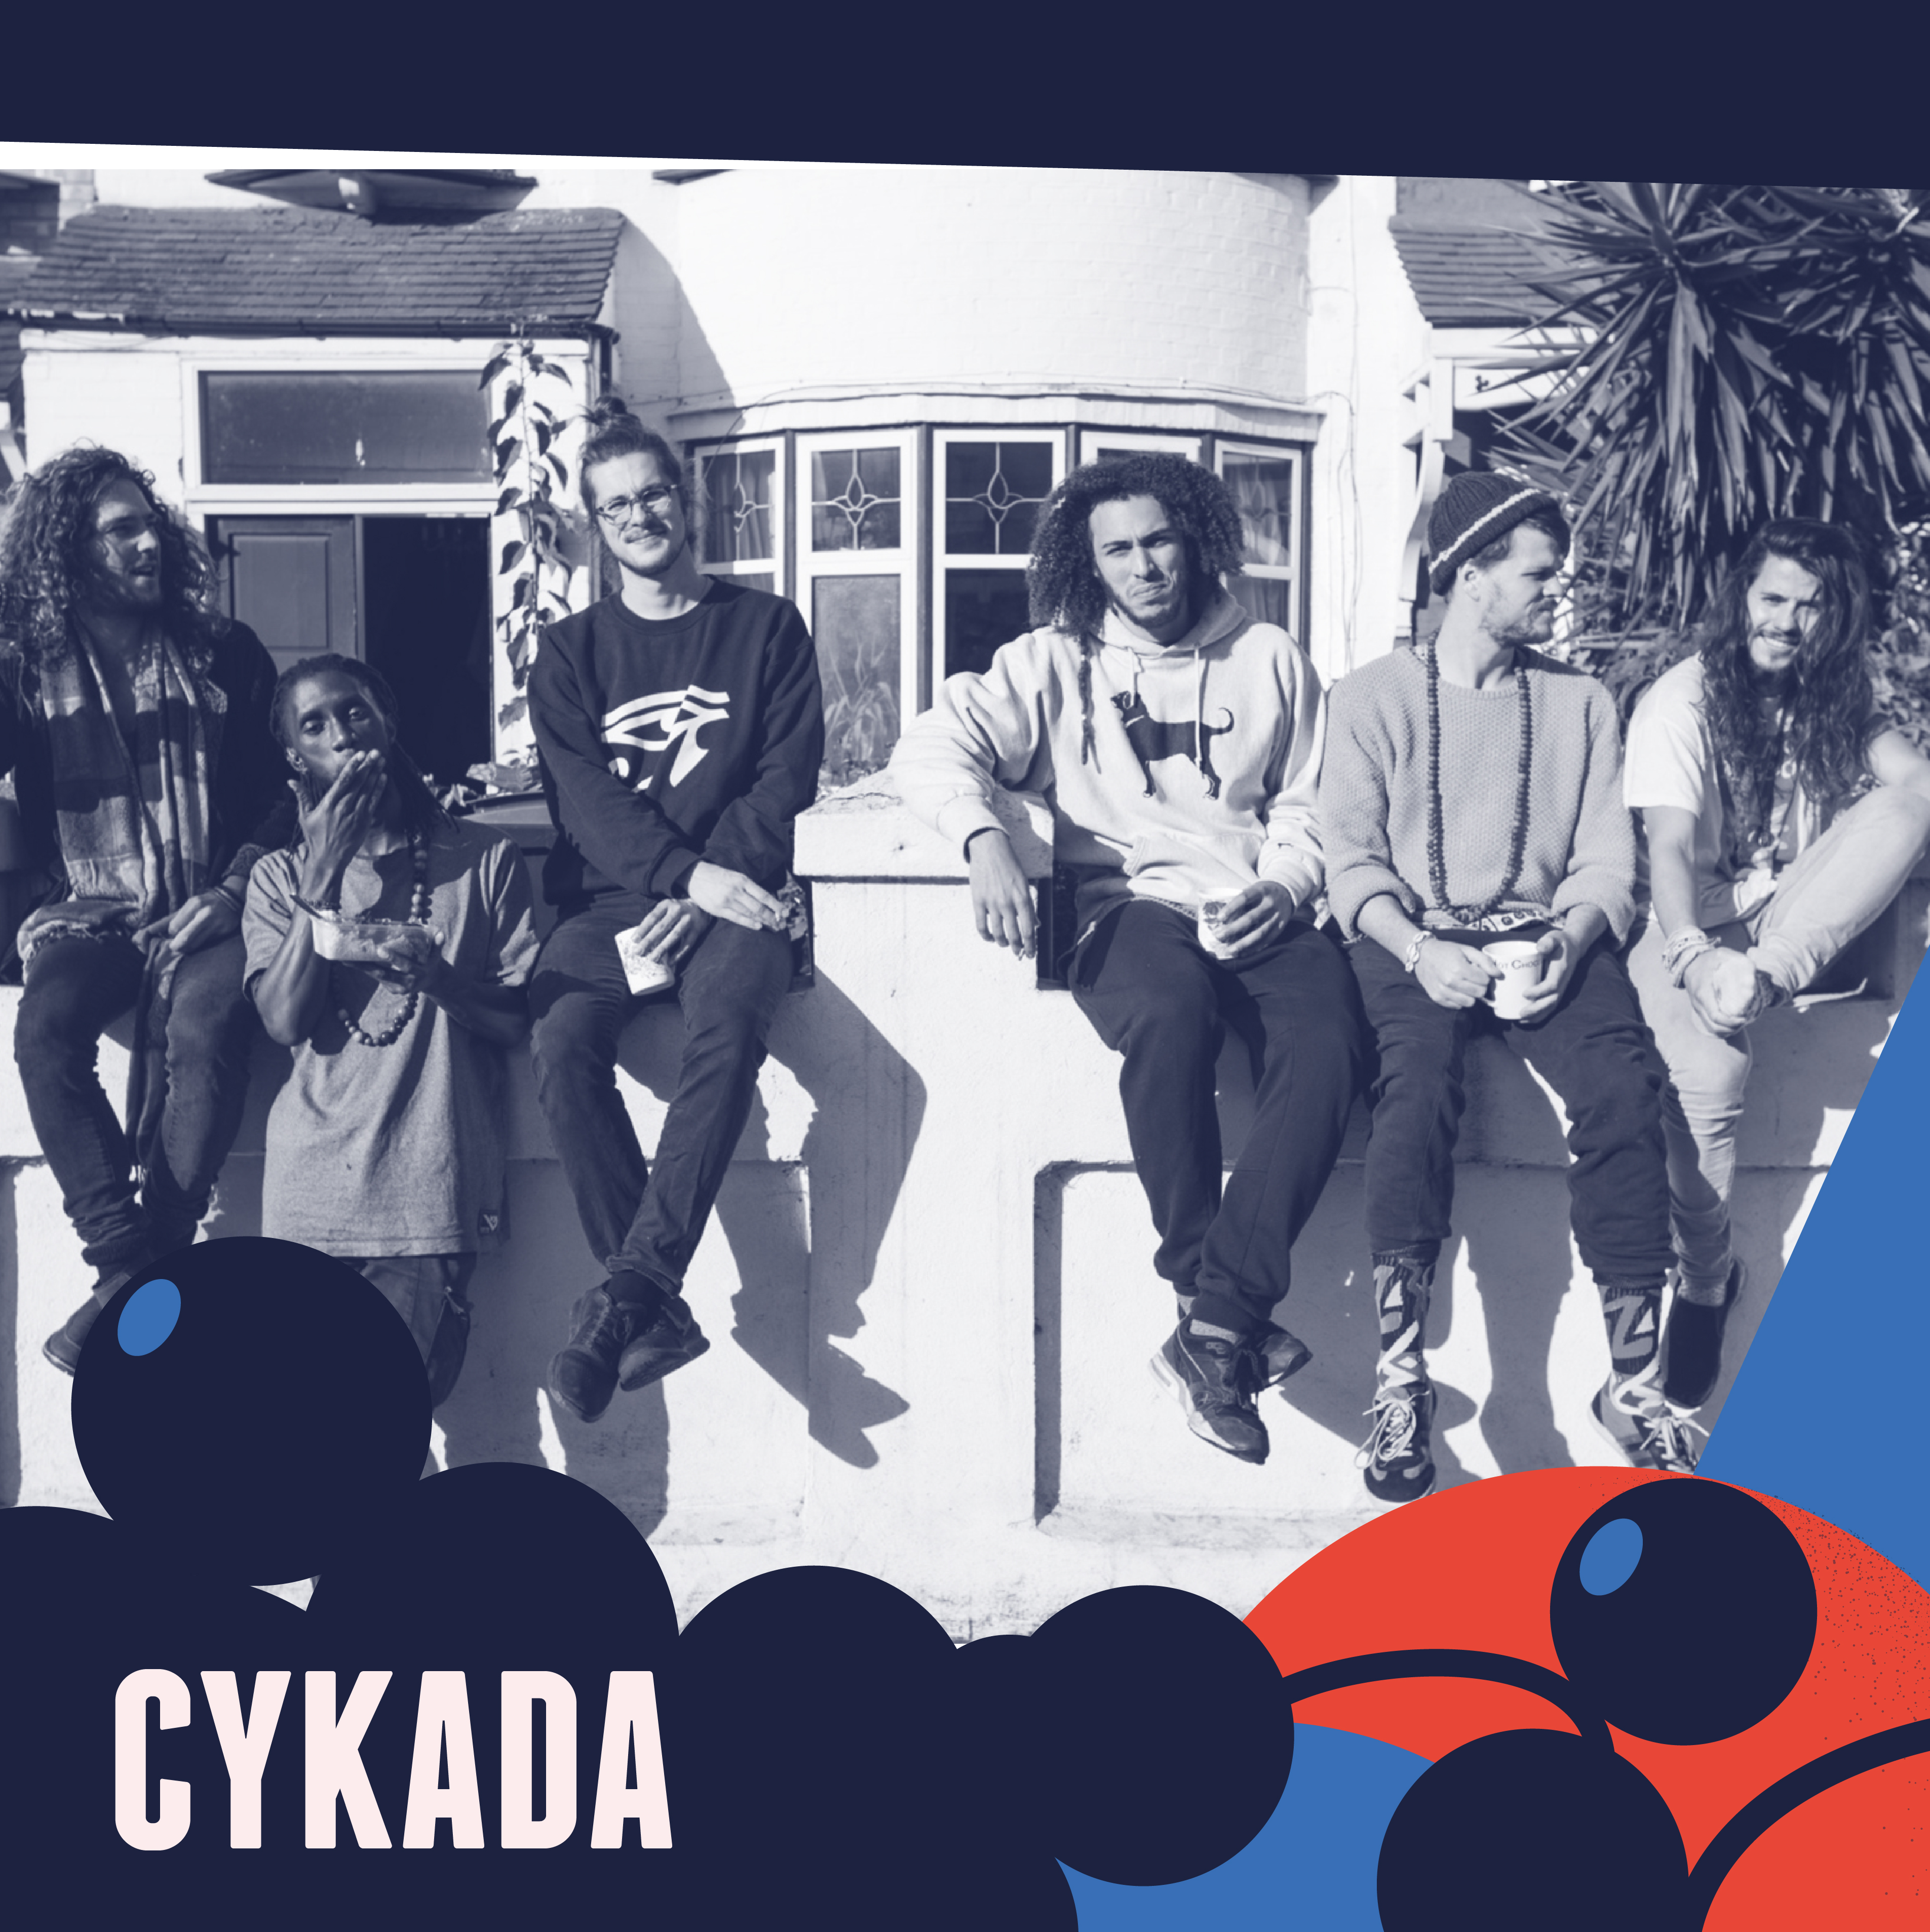 Cykada - Peel Slowly and See 2020